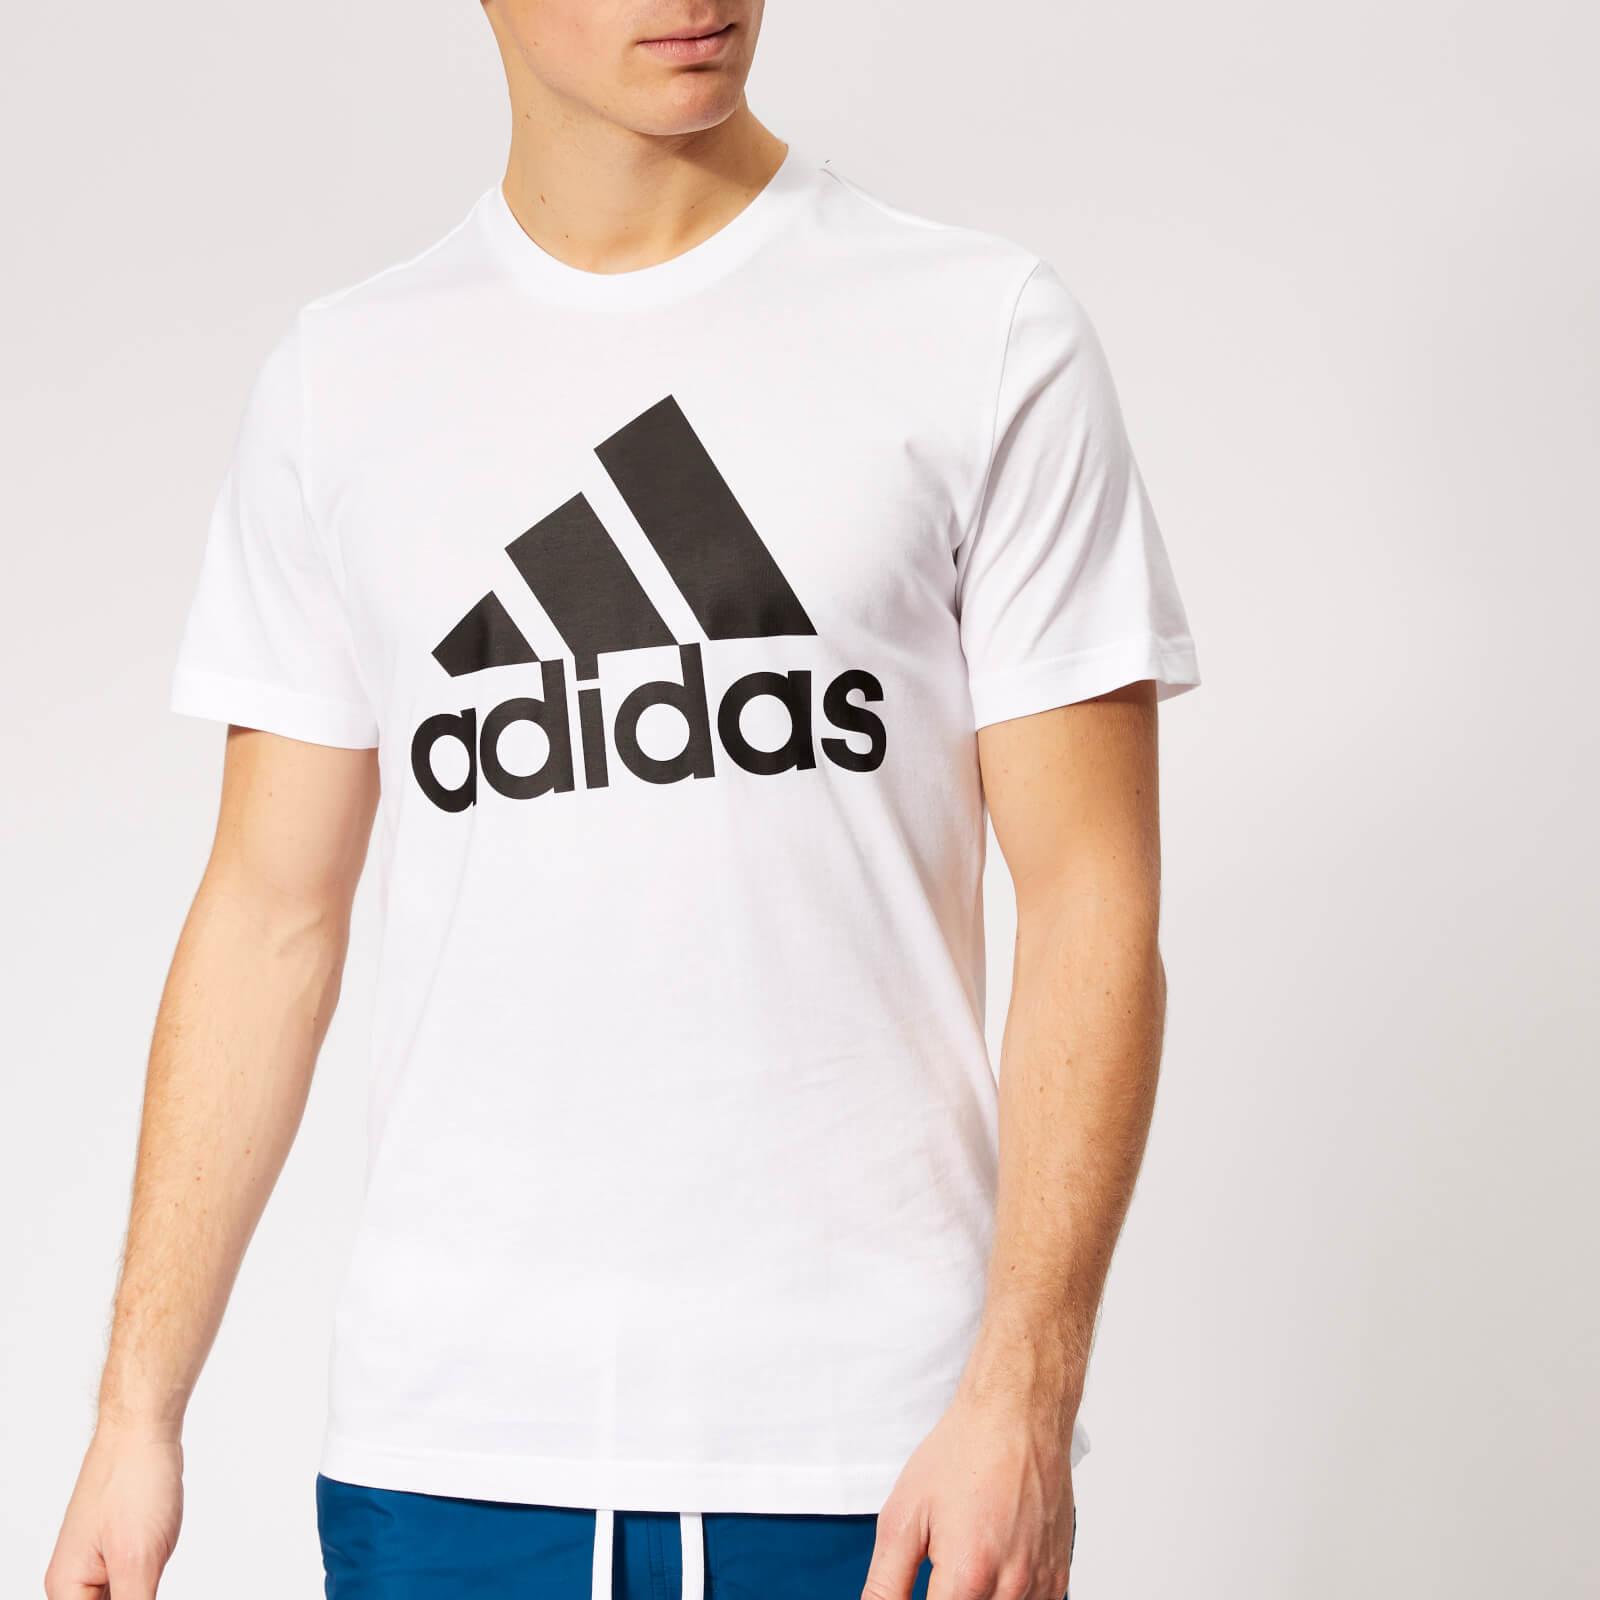 adidas Men's Must Haves Badge of Sport Short Sleeve T-Shirt - White/Black - M - White